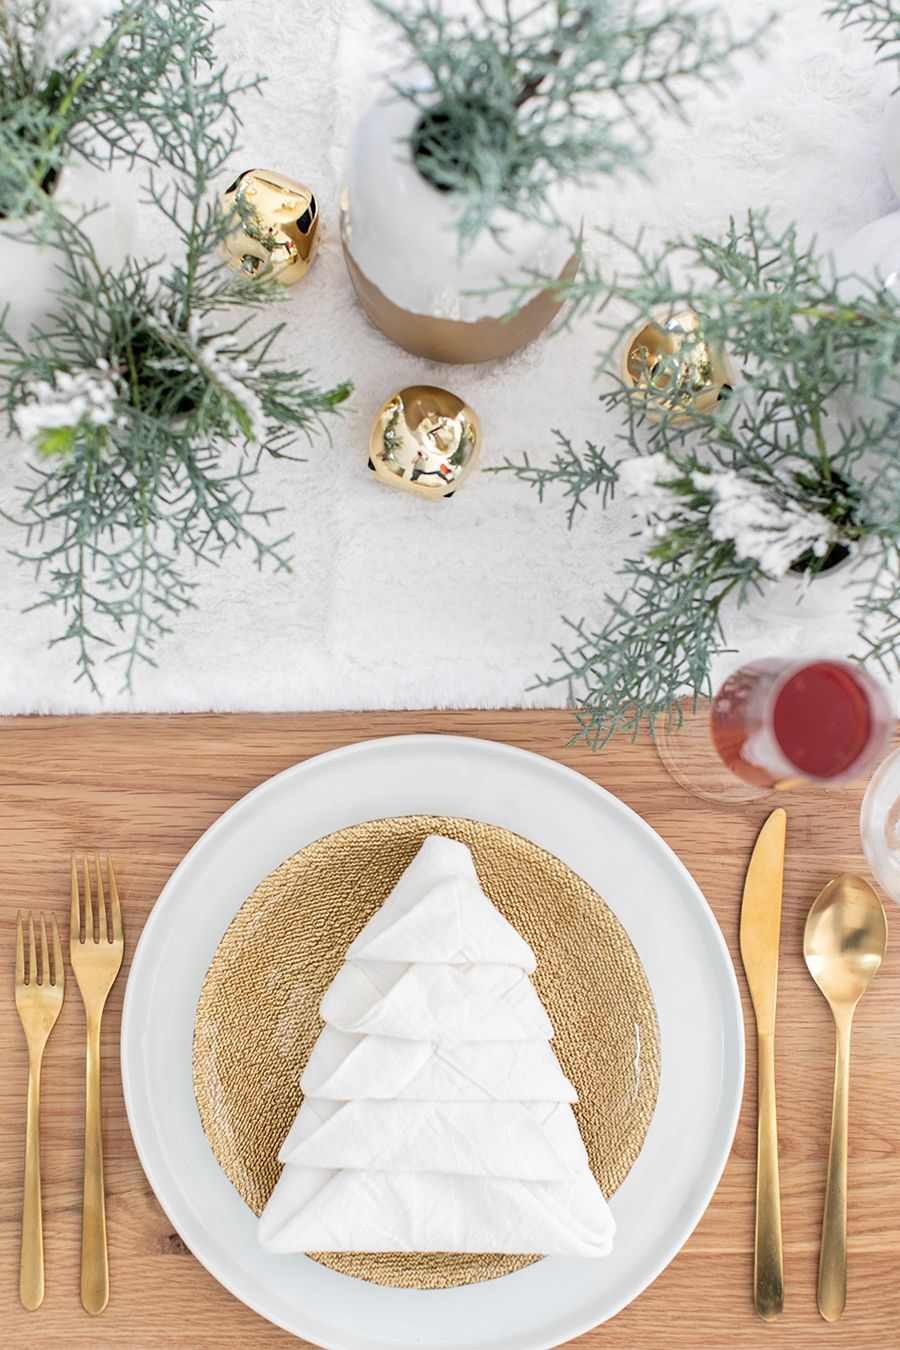 How To Fold Napkin Into Christmas Tree.21 Best Napkin Folding Ideas How To Fold Napkins